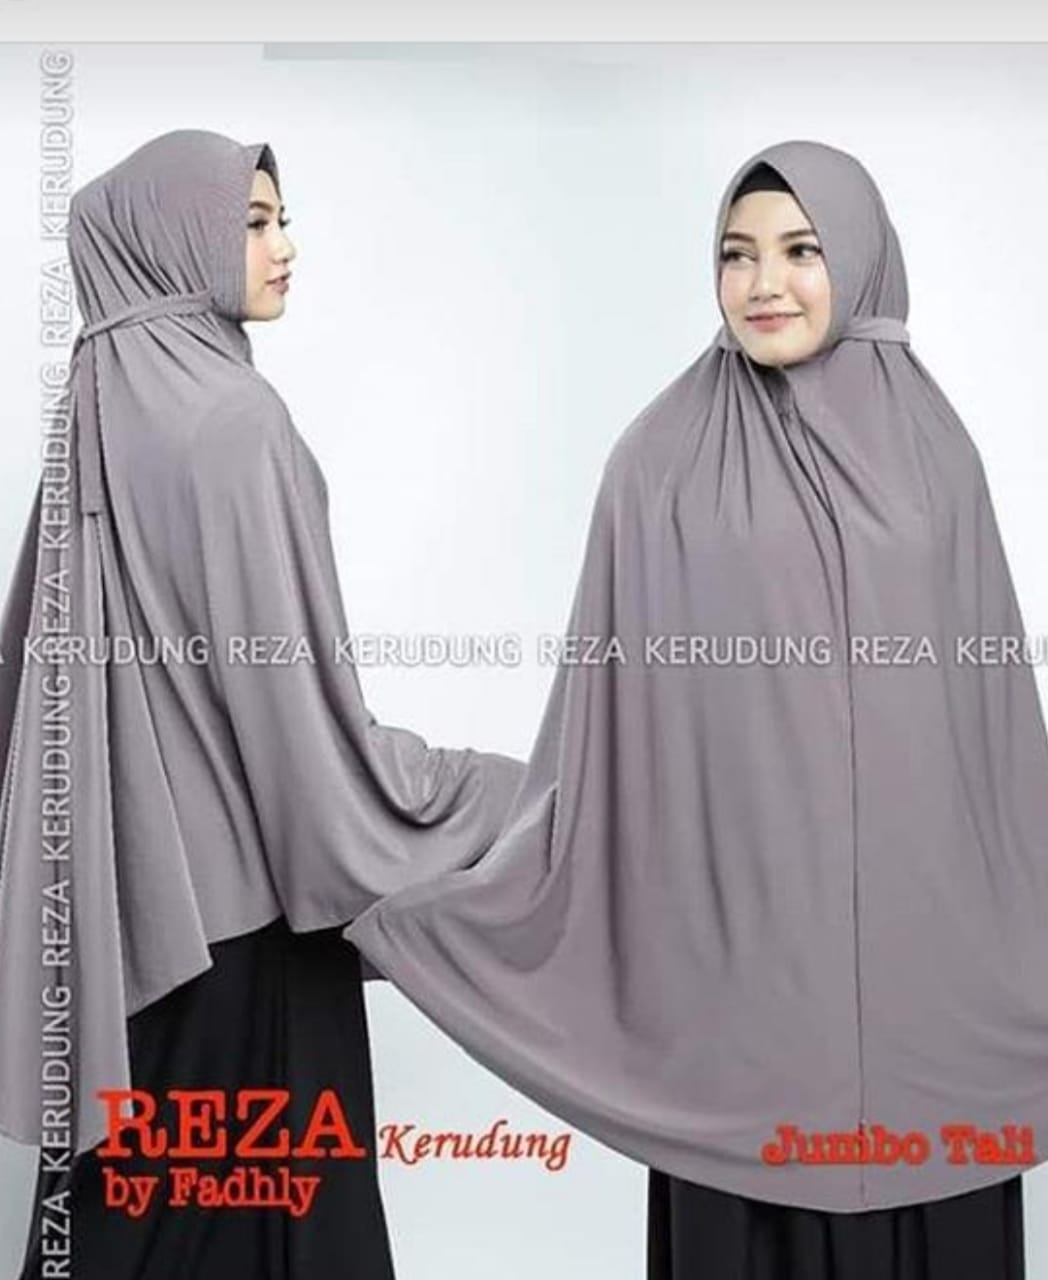 Salmi Scraf Hijab Syar I Jersy Reza Tali Jumbo Hijab Instan Hijab Syar I Terbaru Jilbab Syar I Fashion Wanita Murah Kerudung Wanita Lazada Indonesia